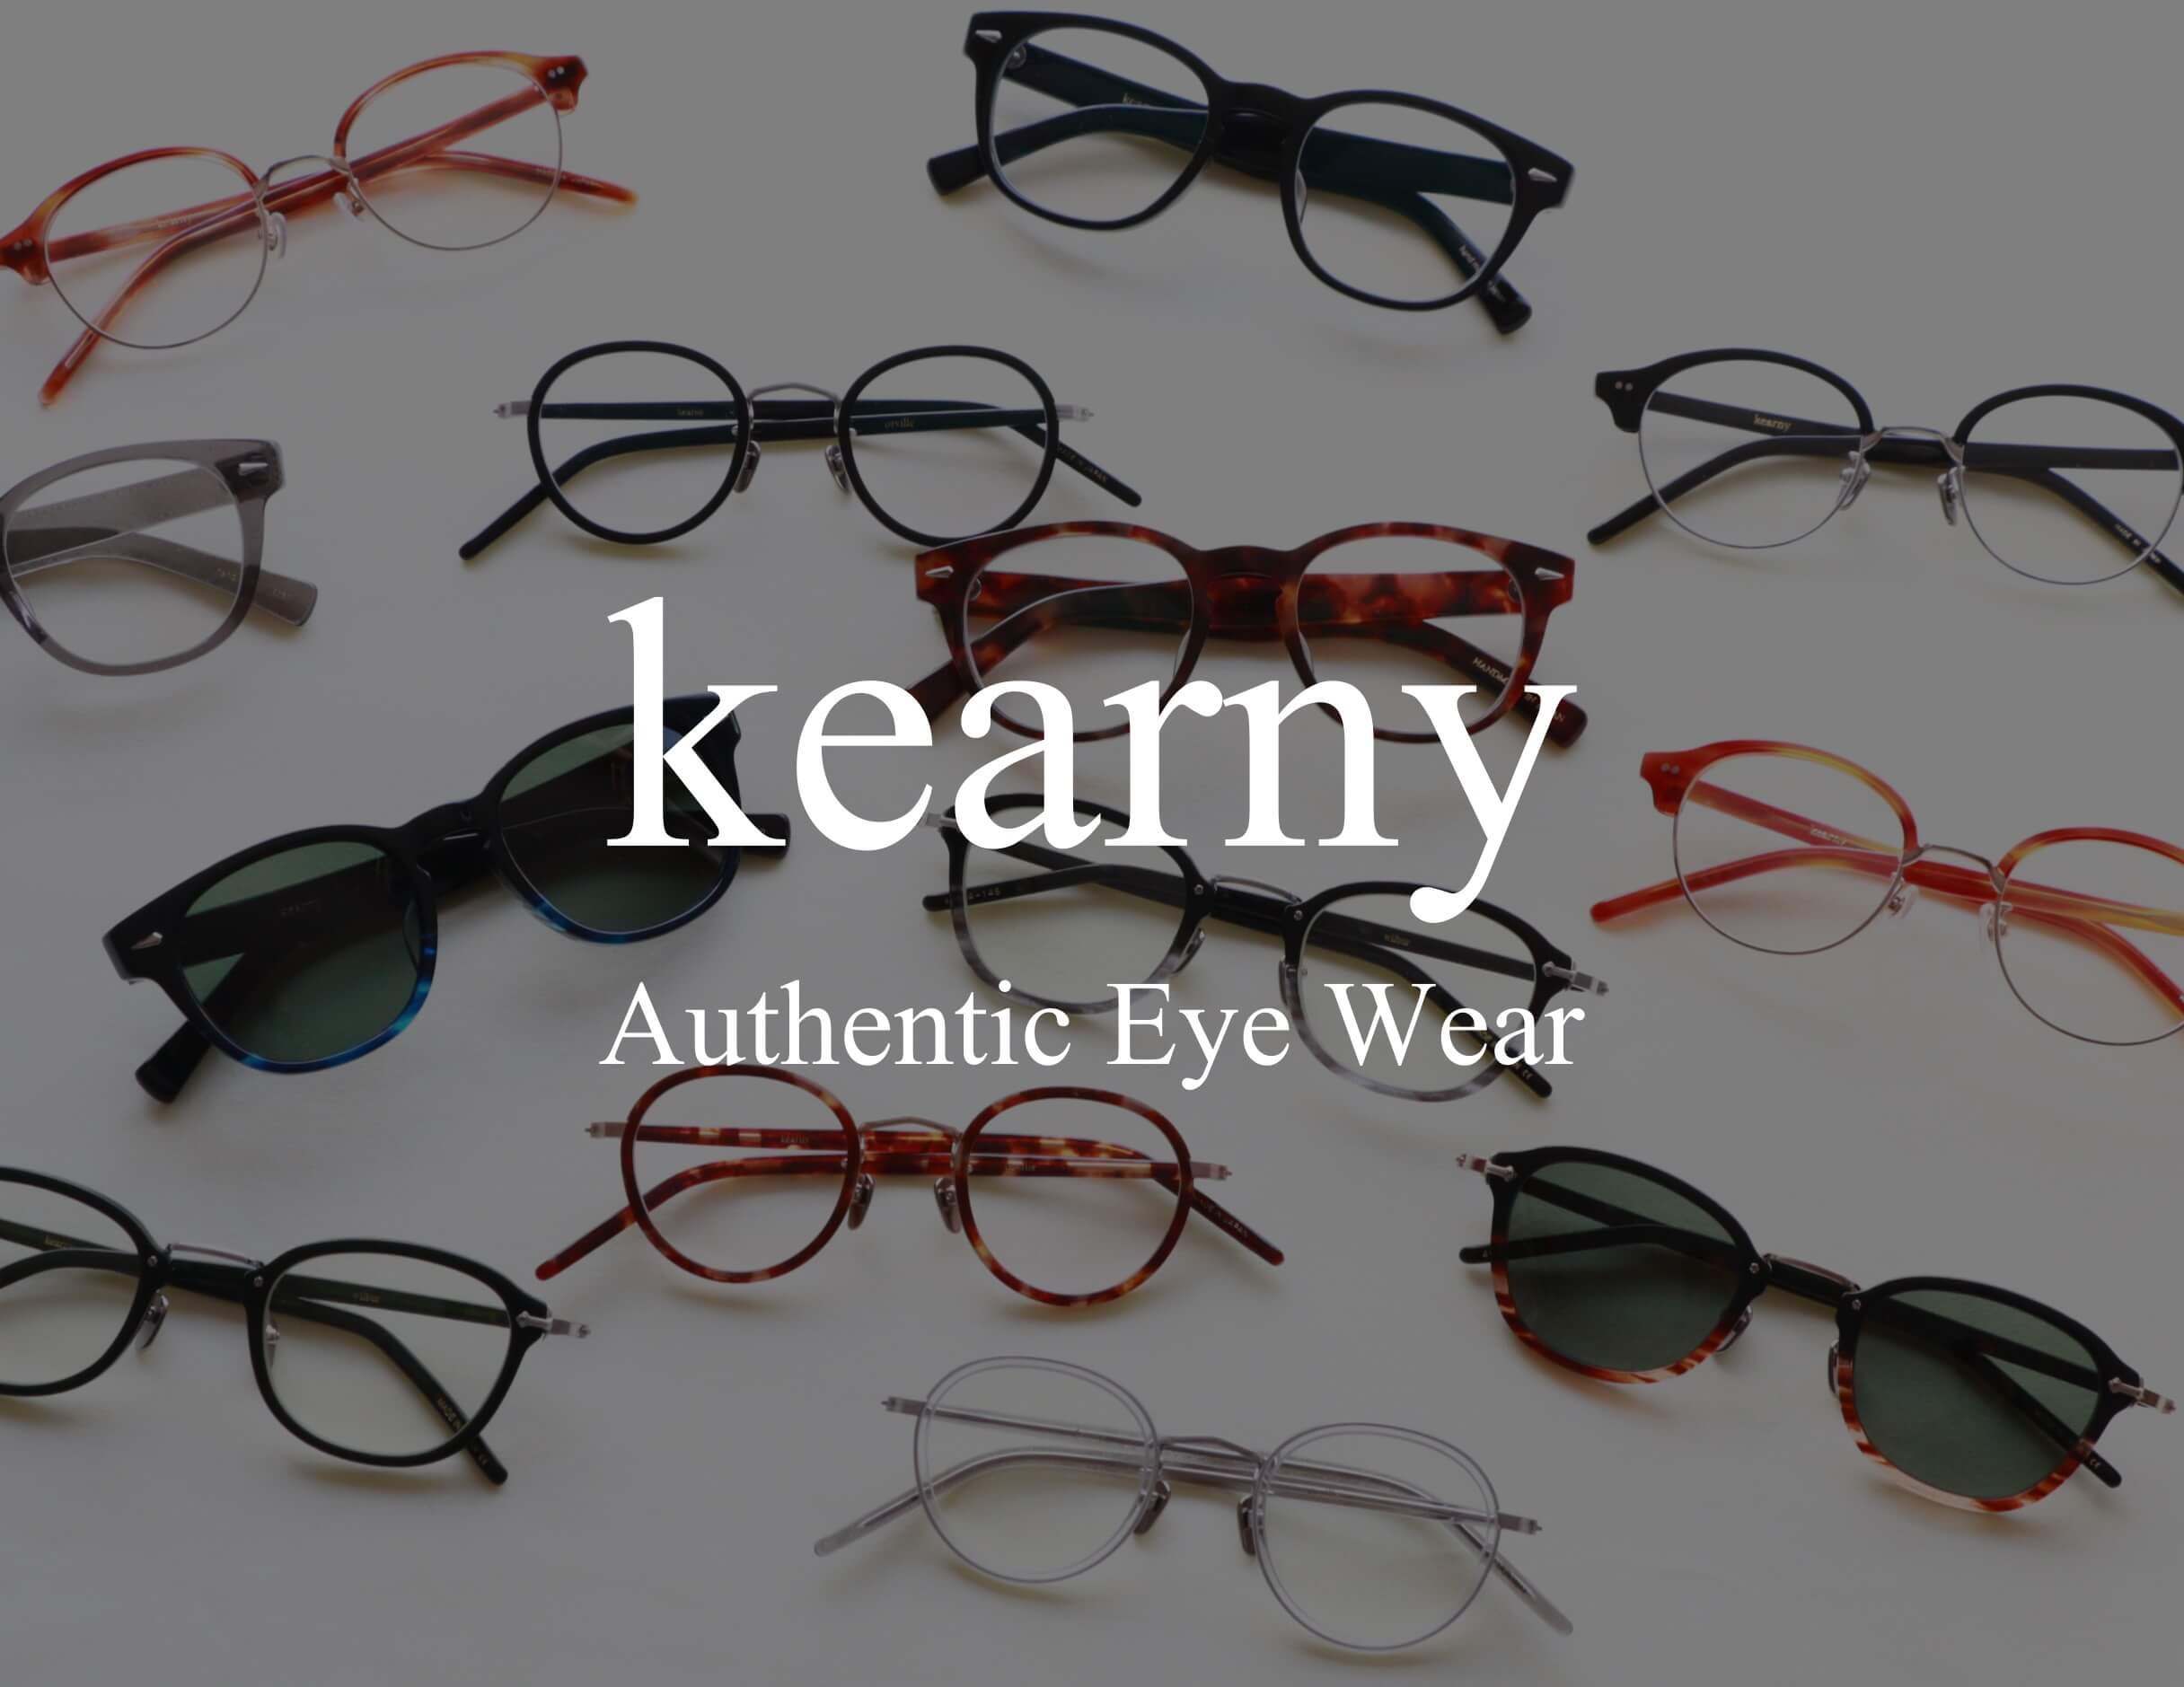 kearny カーニー セルロイド眼鏡